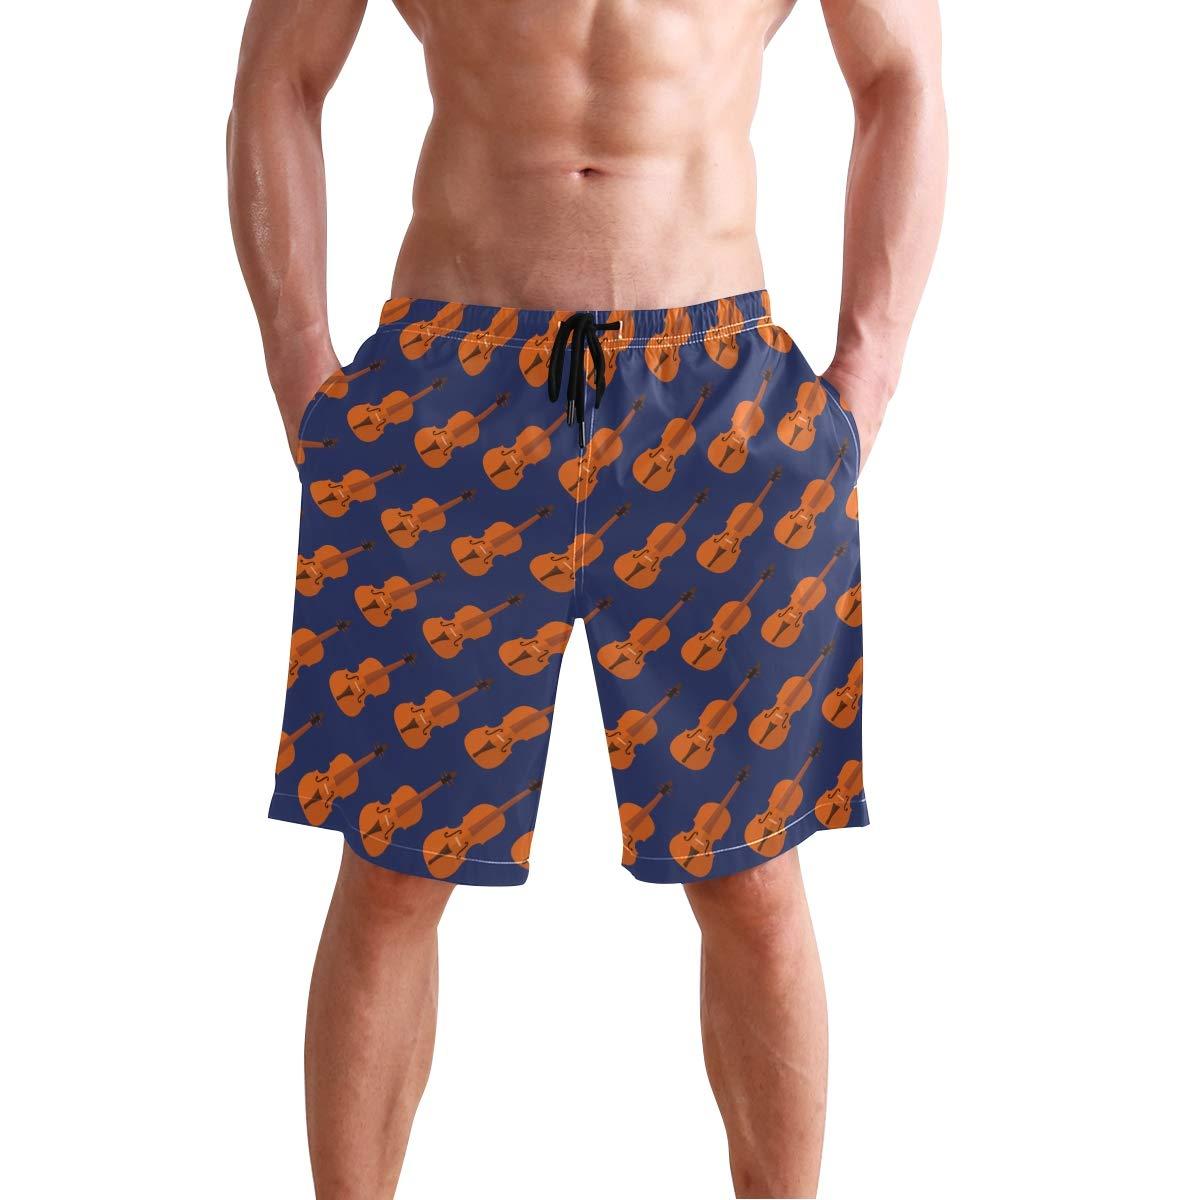 DongDongQiang Men Summer Violin Pattern Quick Dry Volleyball Beach Shorts Board Shorts